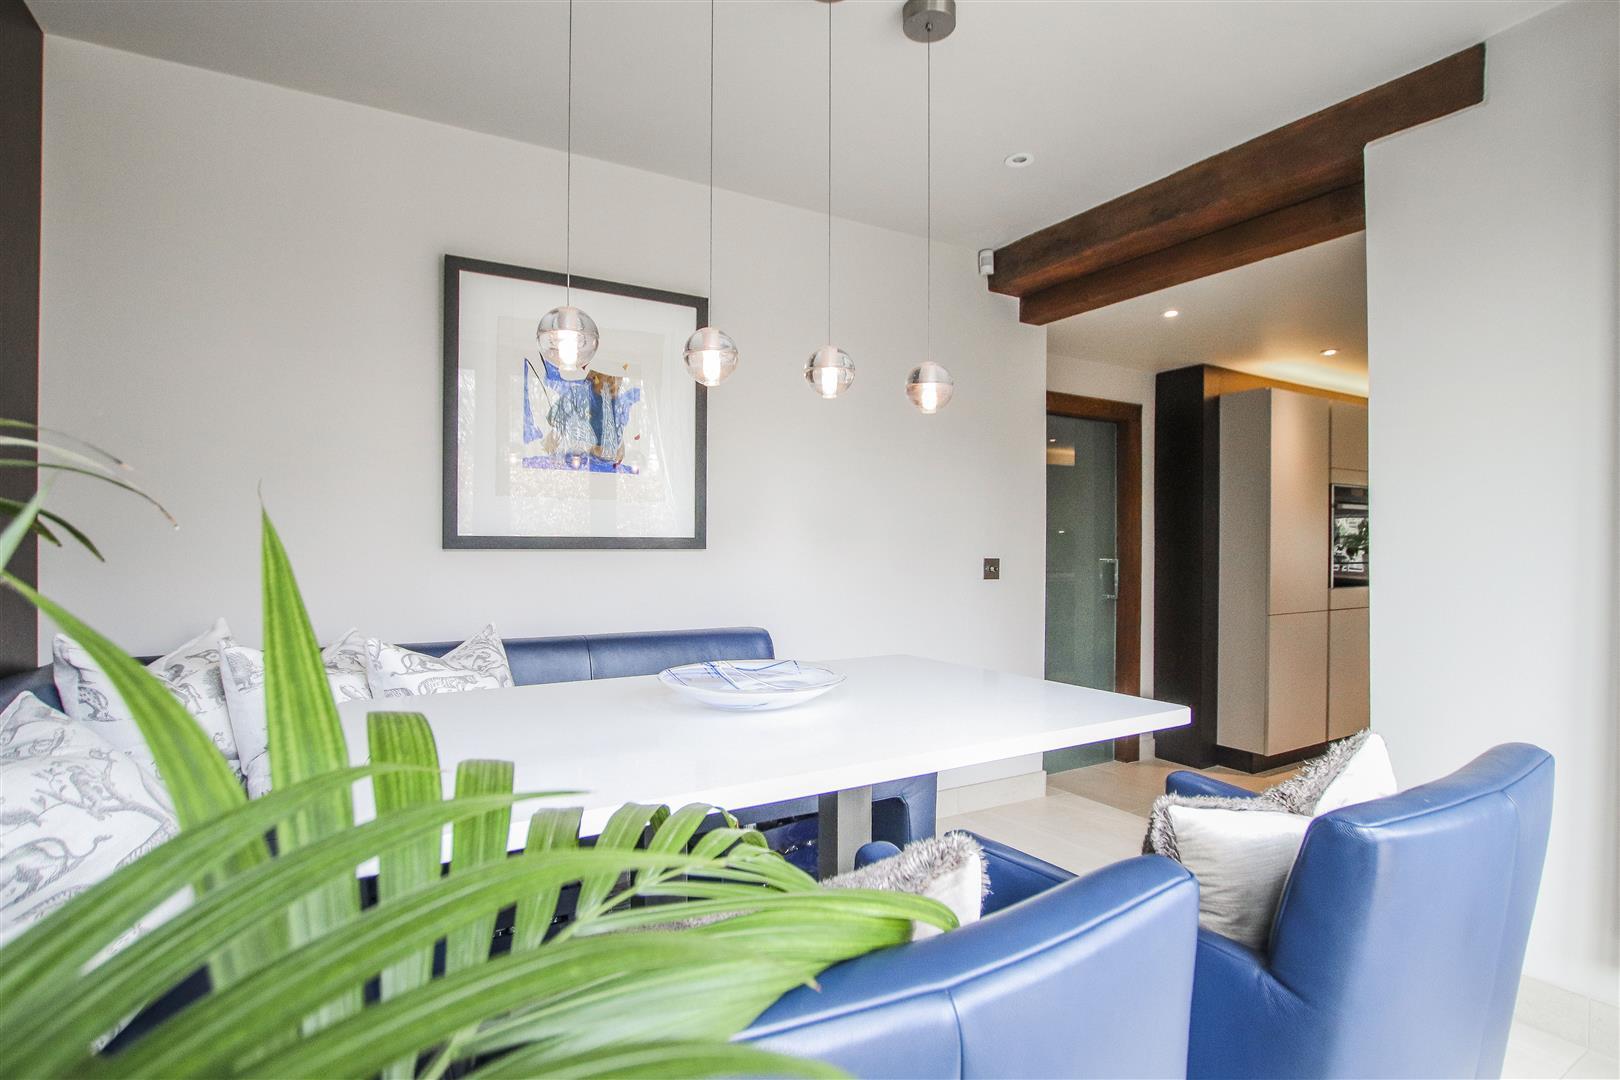 5 Bedroom Semi-detached House For Sale - 12.JPG